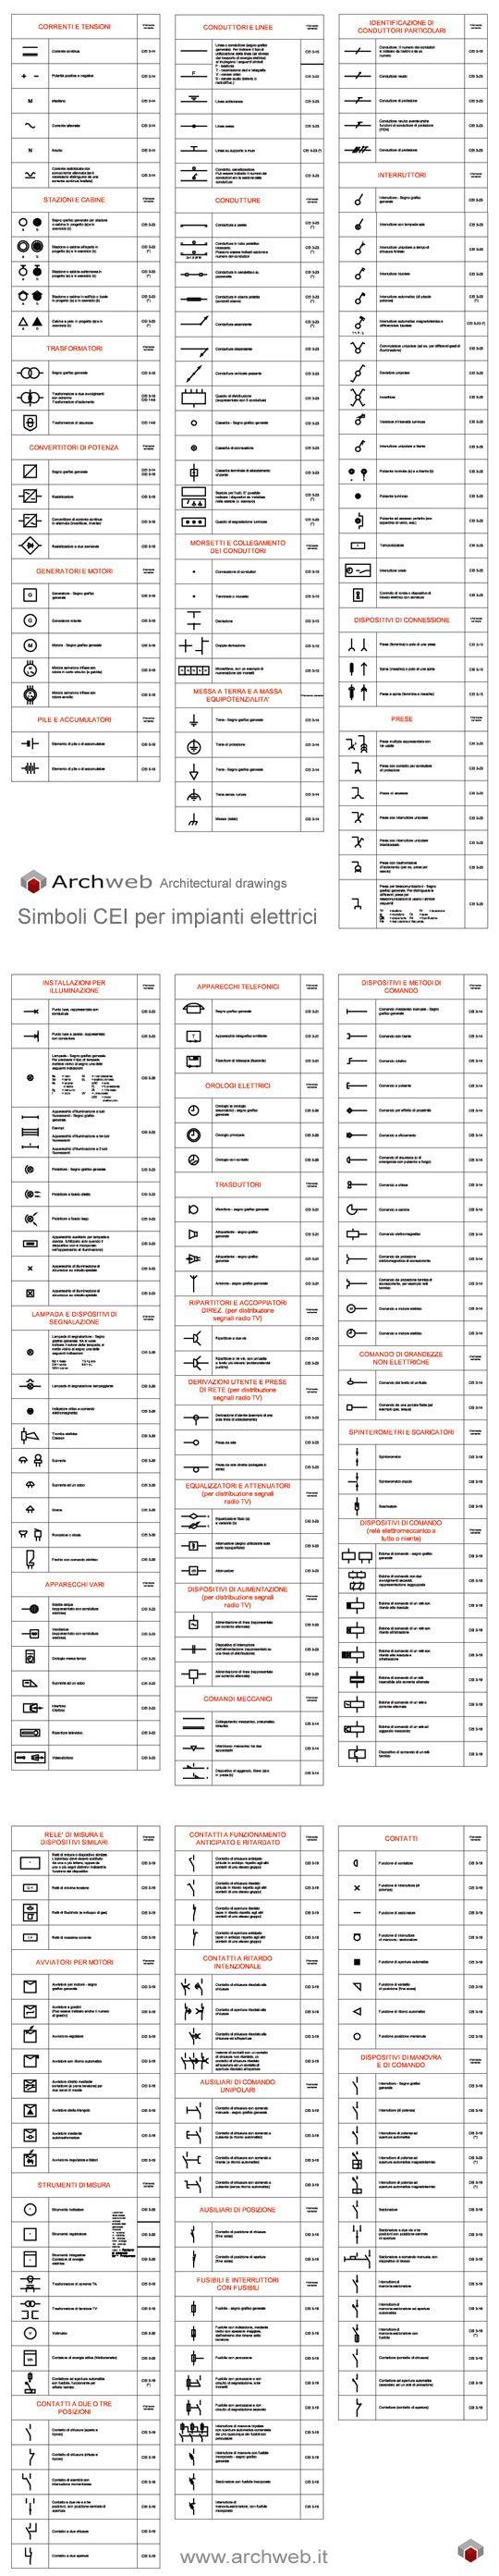 Schema Elettrico Simboli : Assez simboli cei per impianti elettrici tz desktop